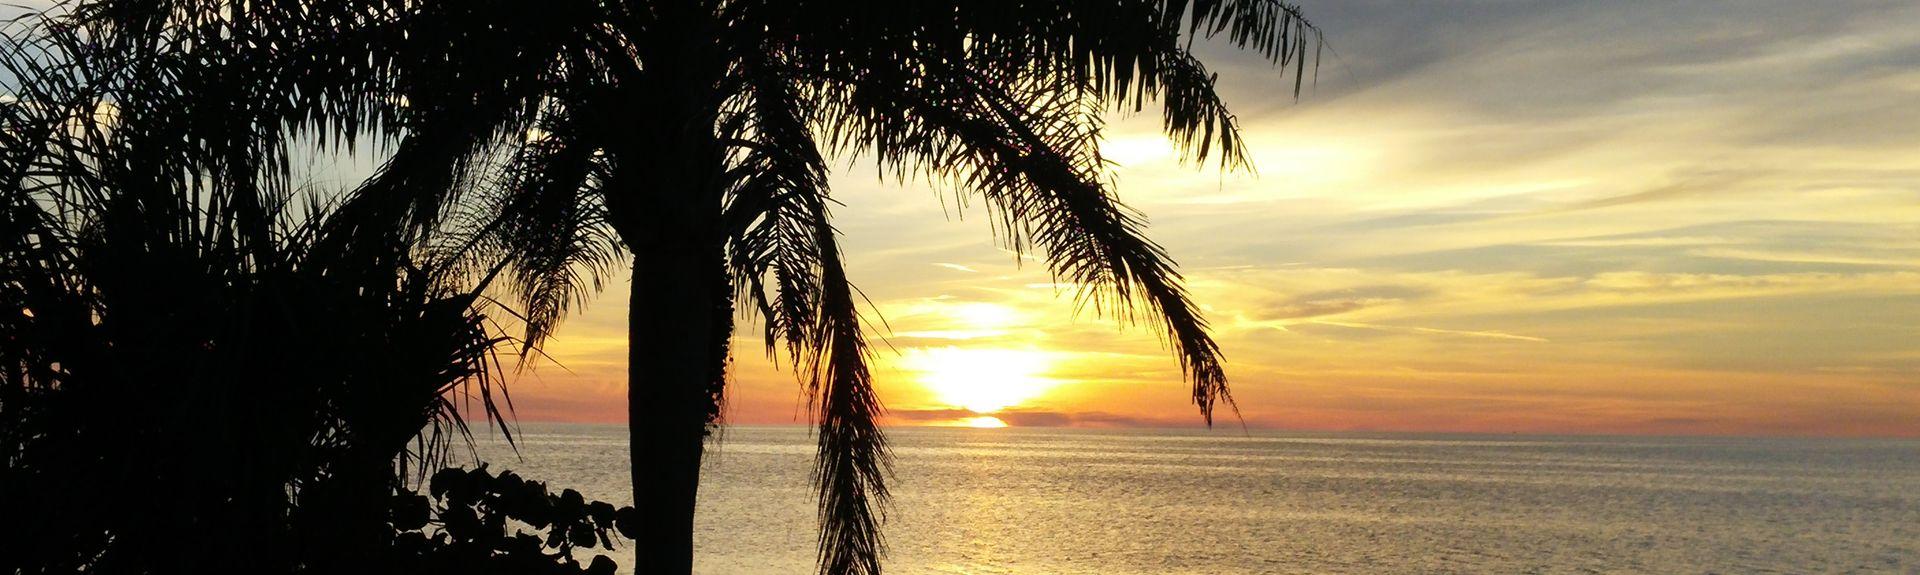 Hudson Beach, Hudson, Florida, United States of America